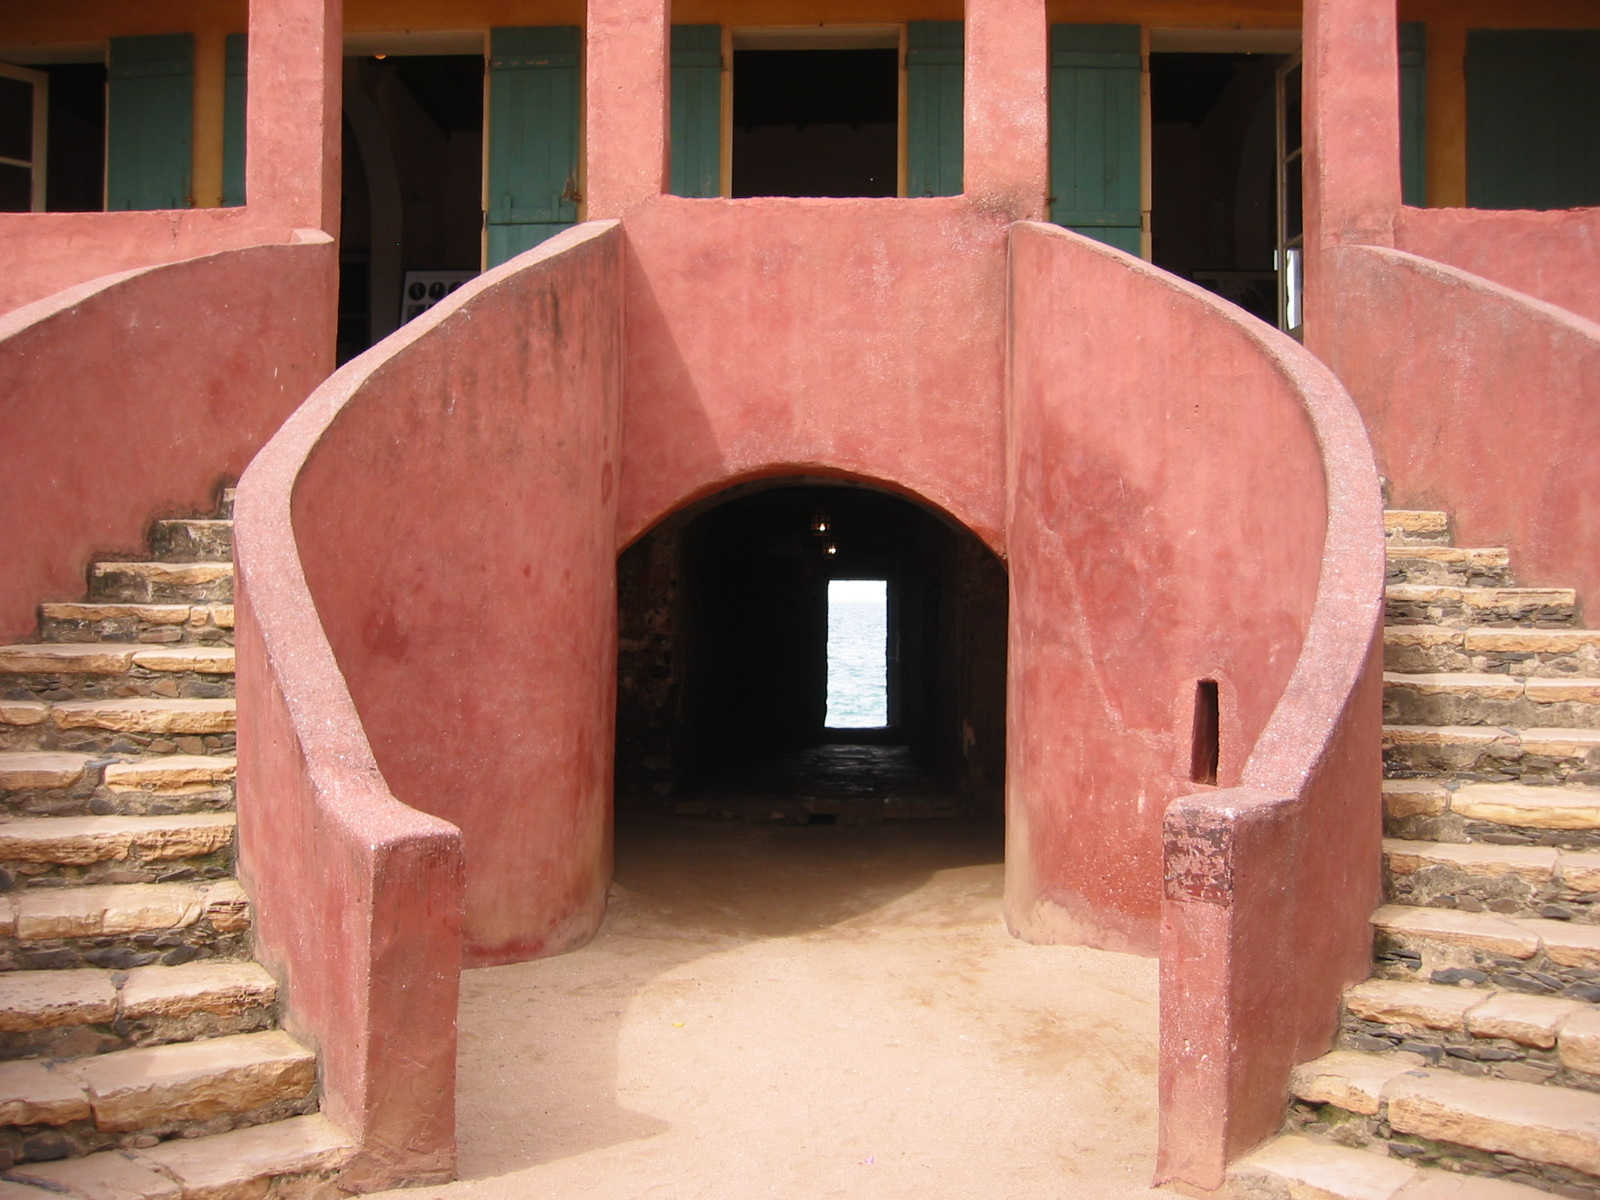 File:Senegal Gorée (8).jpg - Wikimedia Commons